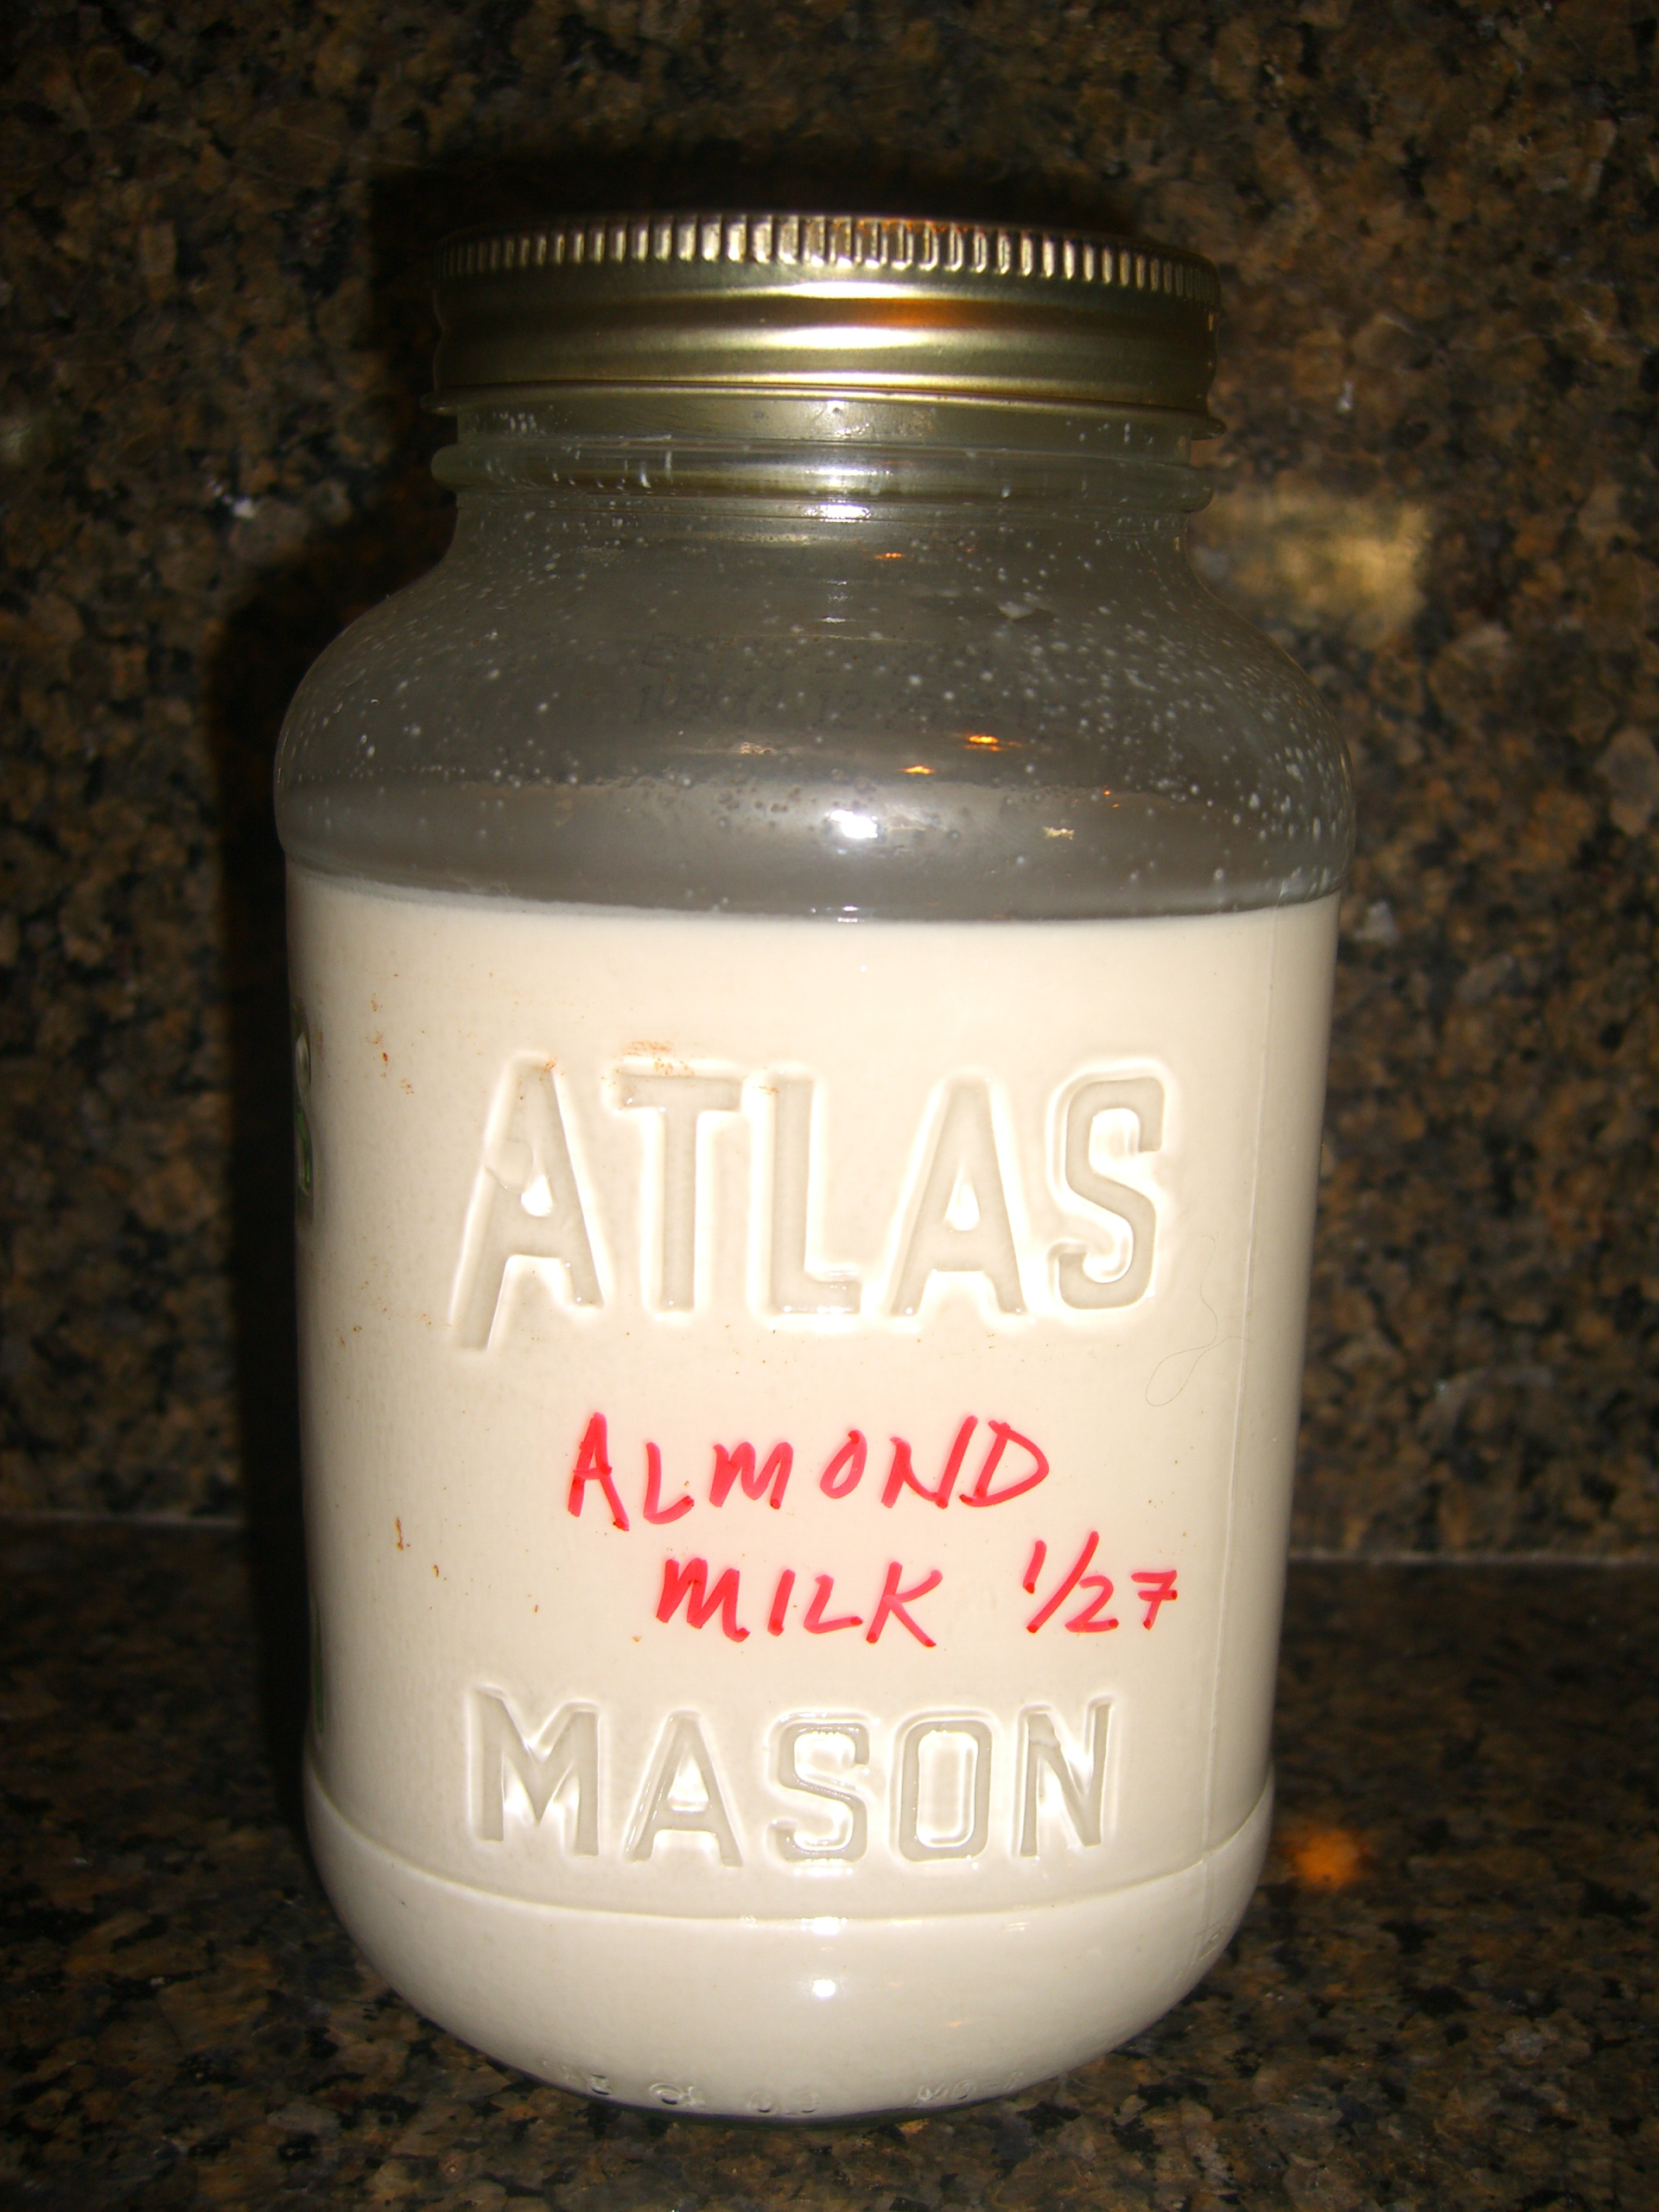 Store Plain Almond Milk in the Fridge in a Mason Jar